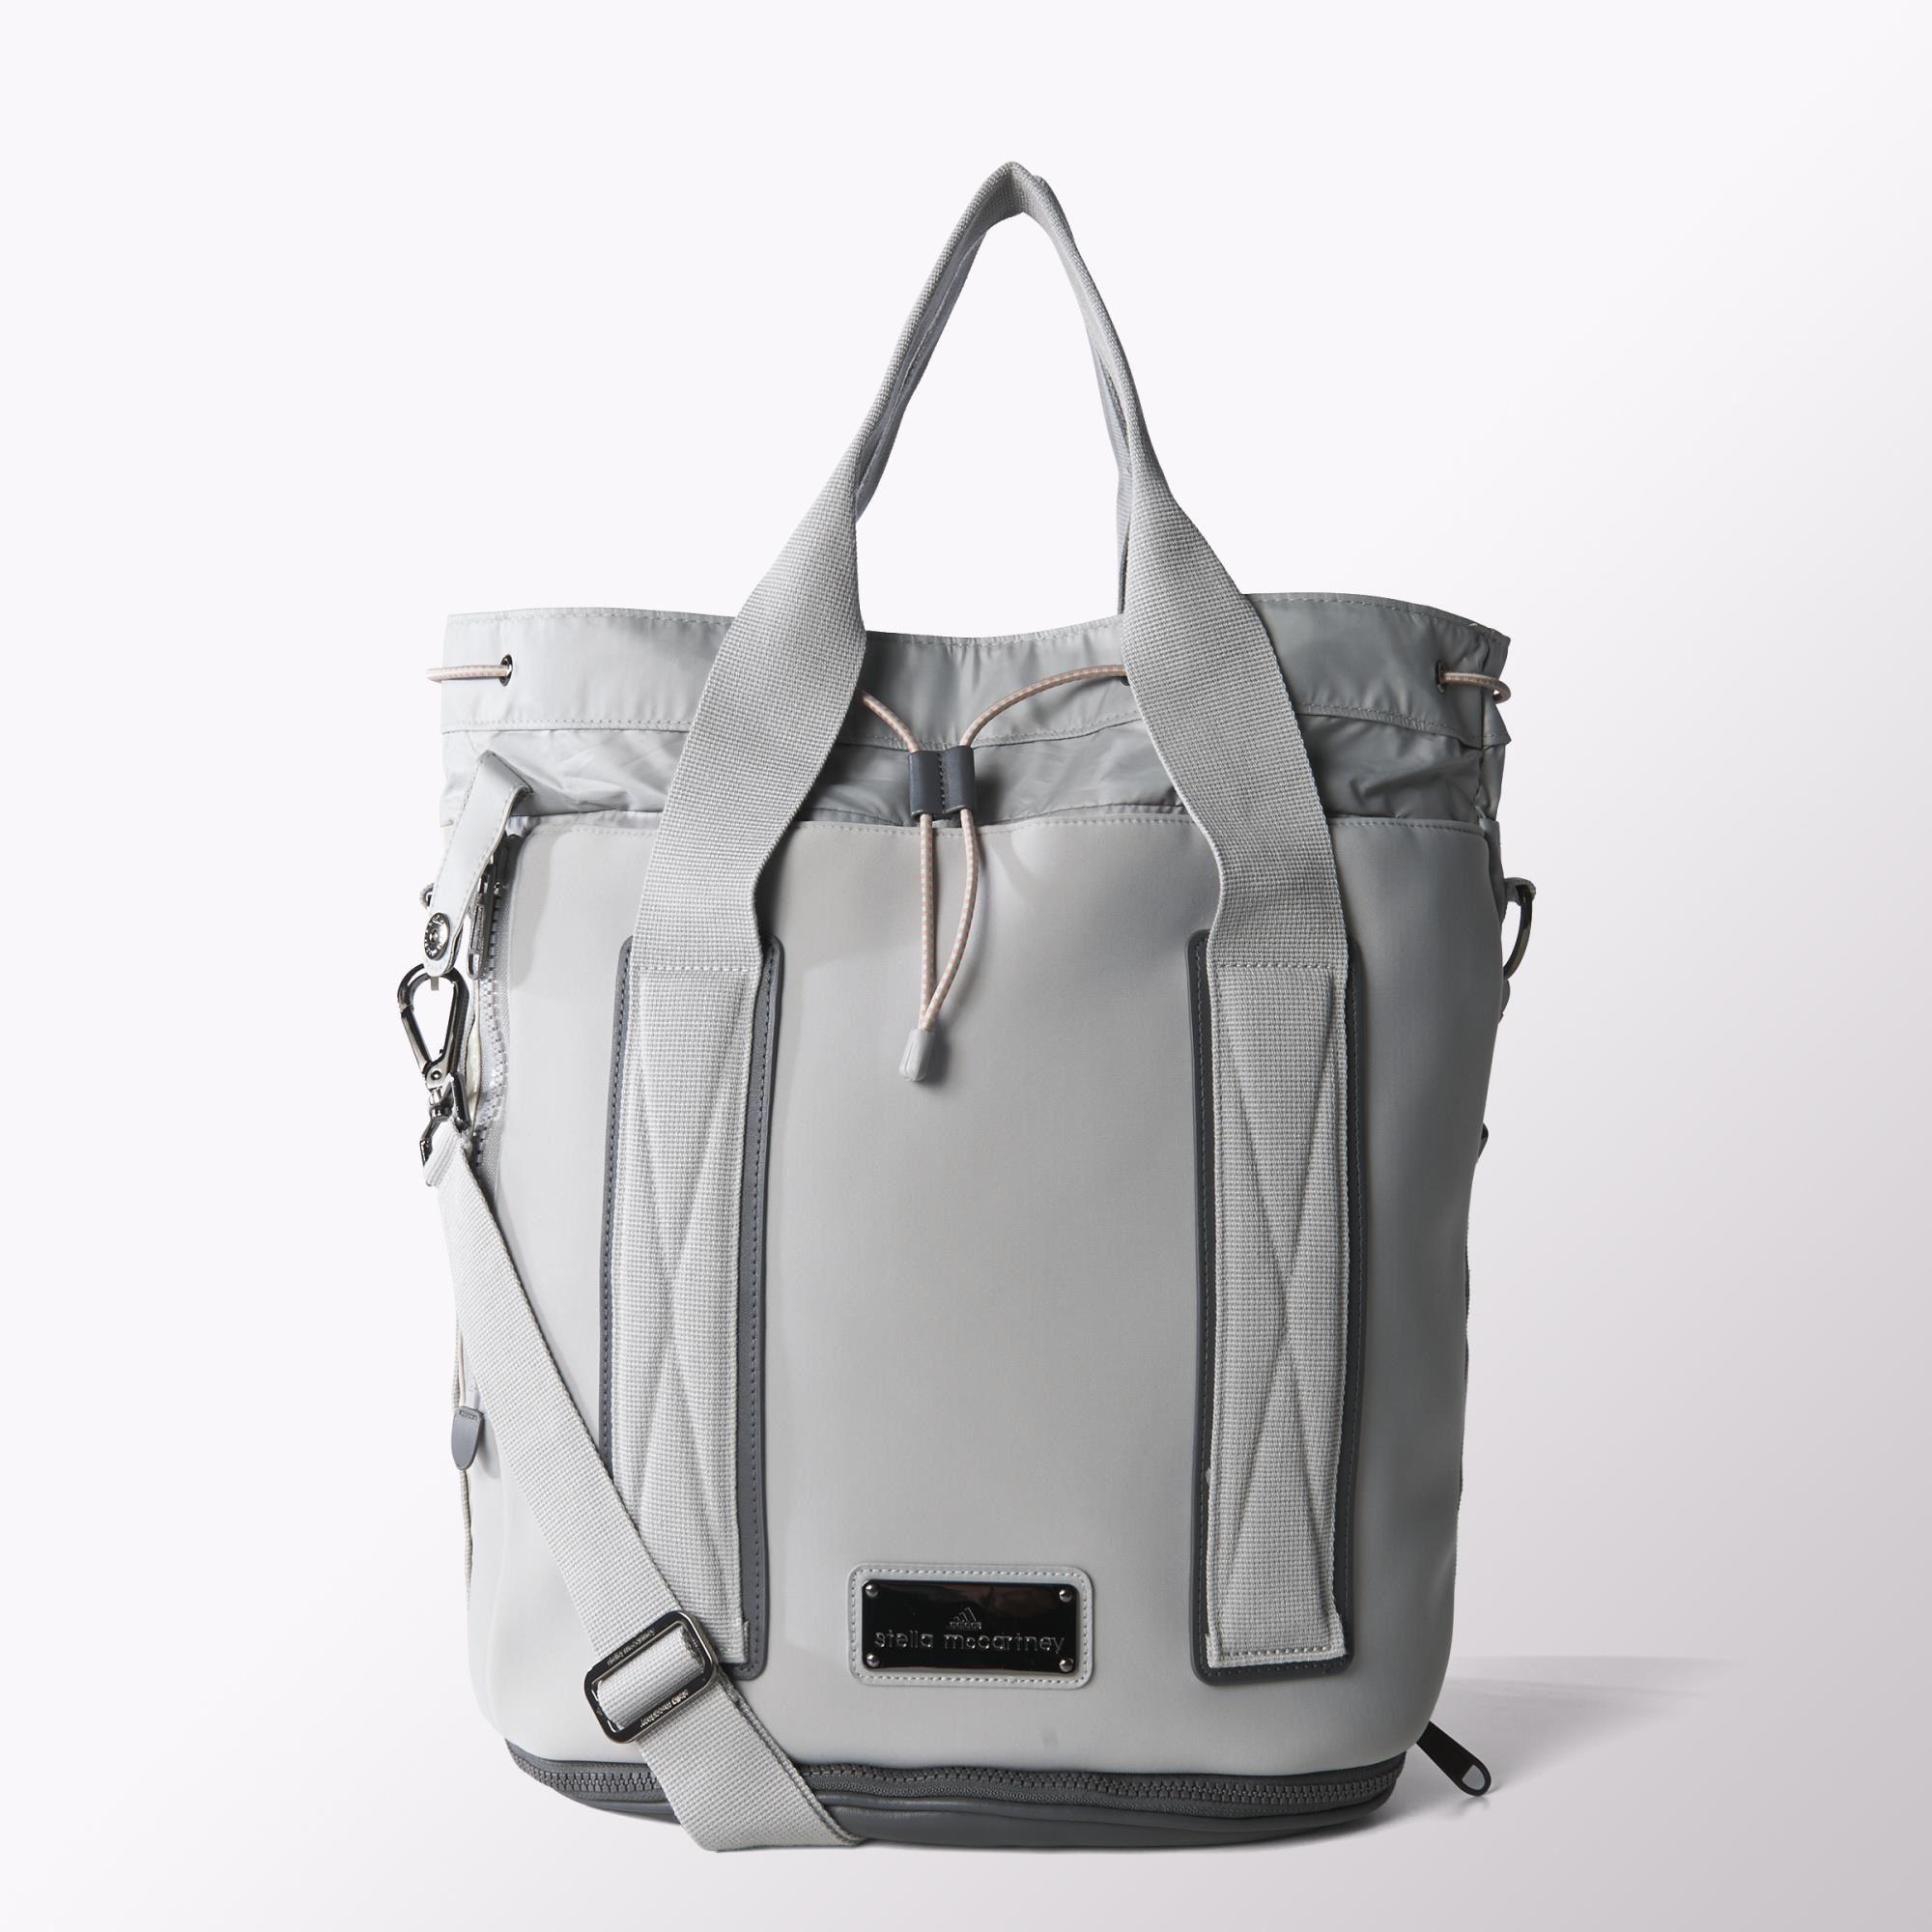 Adidas Tennis Bag Adidas Us Tennis Bag Leather Bag Design Mens Gym Bag